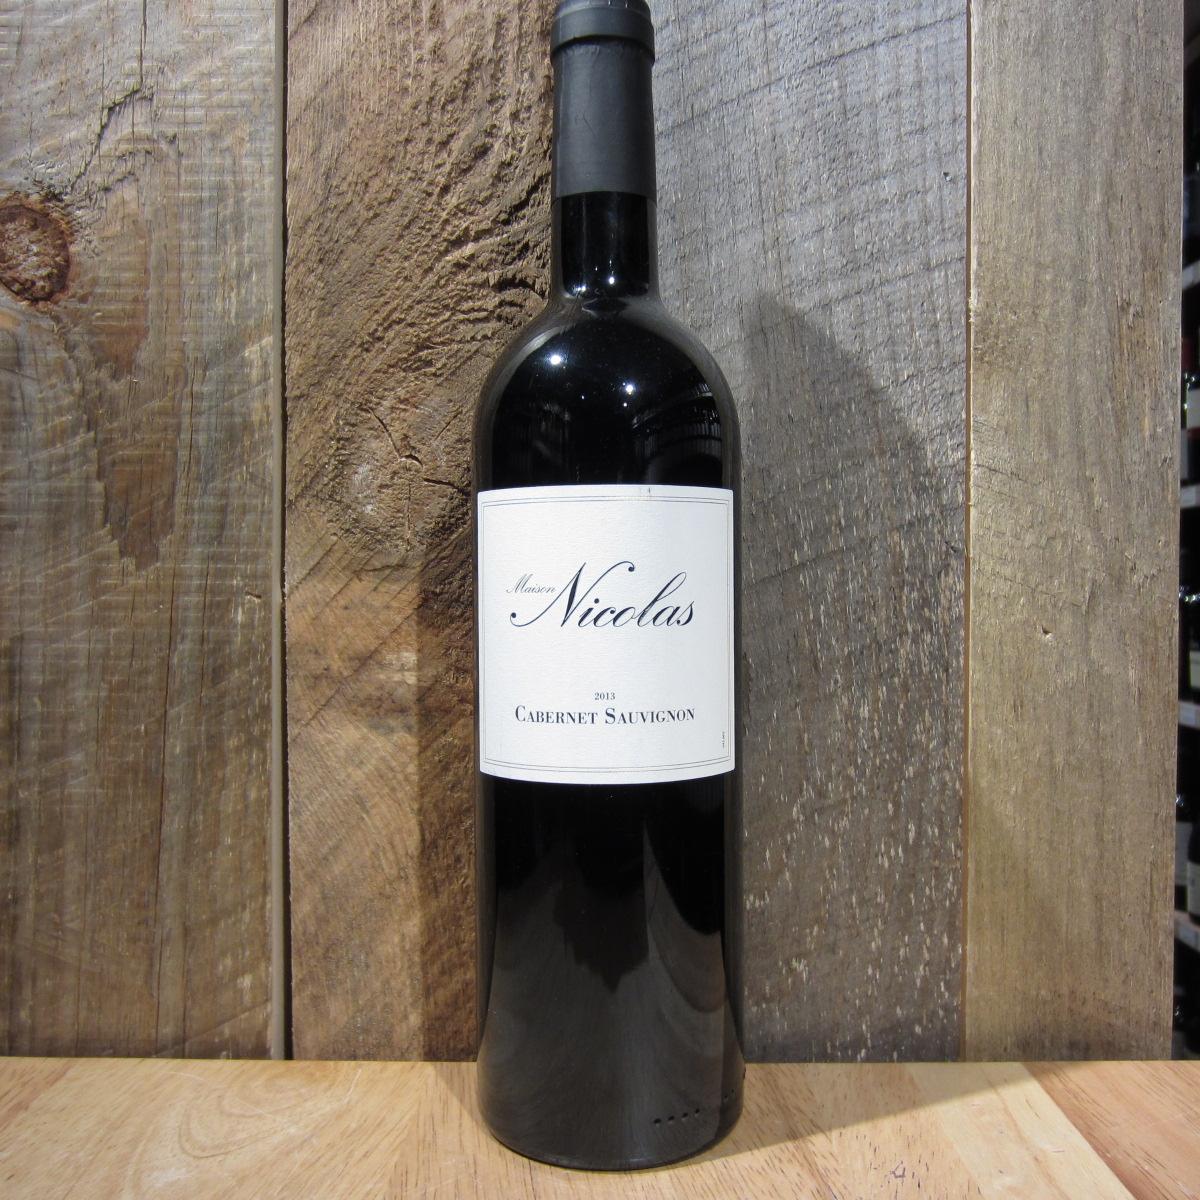 Maison nicolas cabernet sauvignon 750ml oak and barrel for Maison nicolas